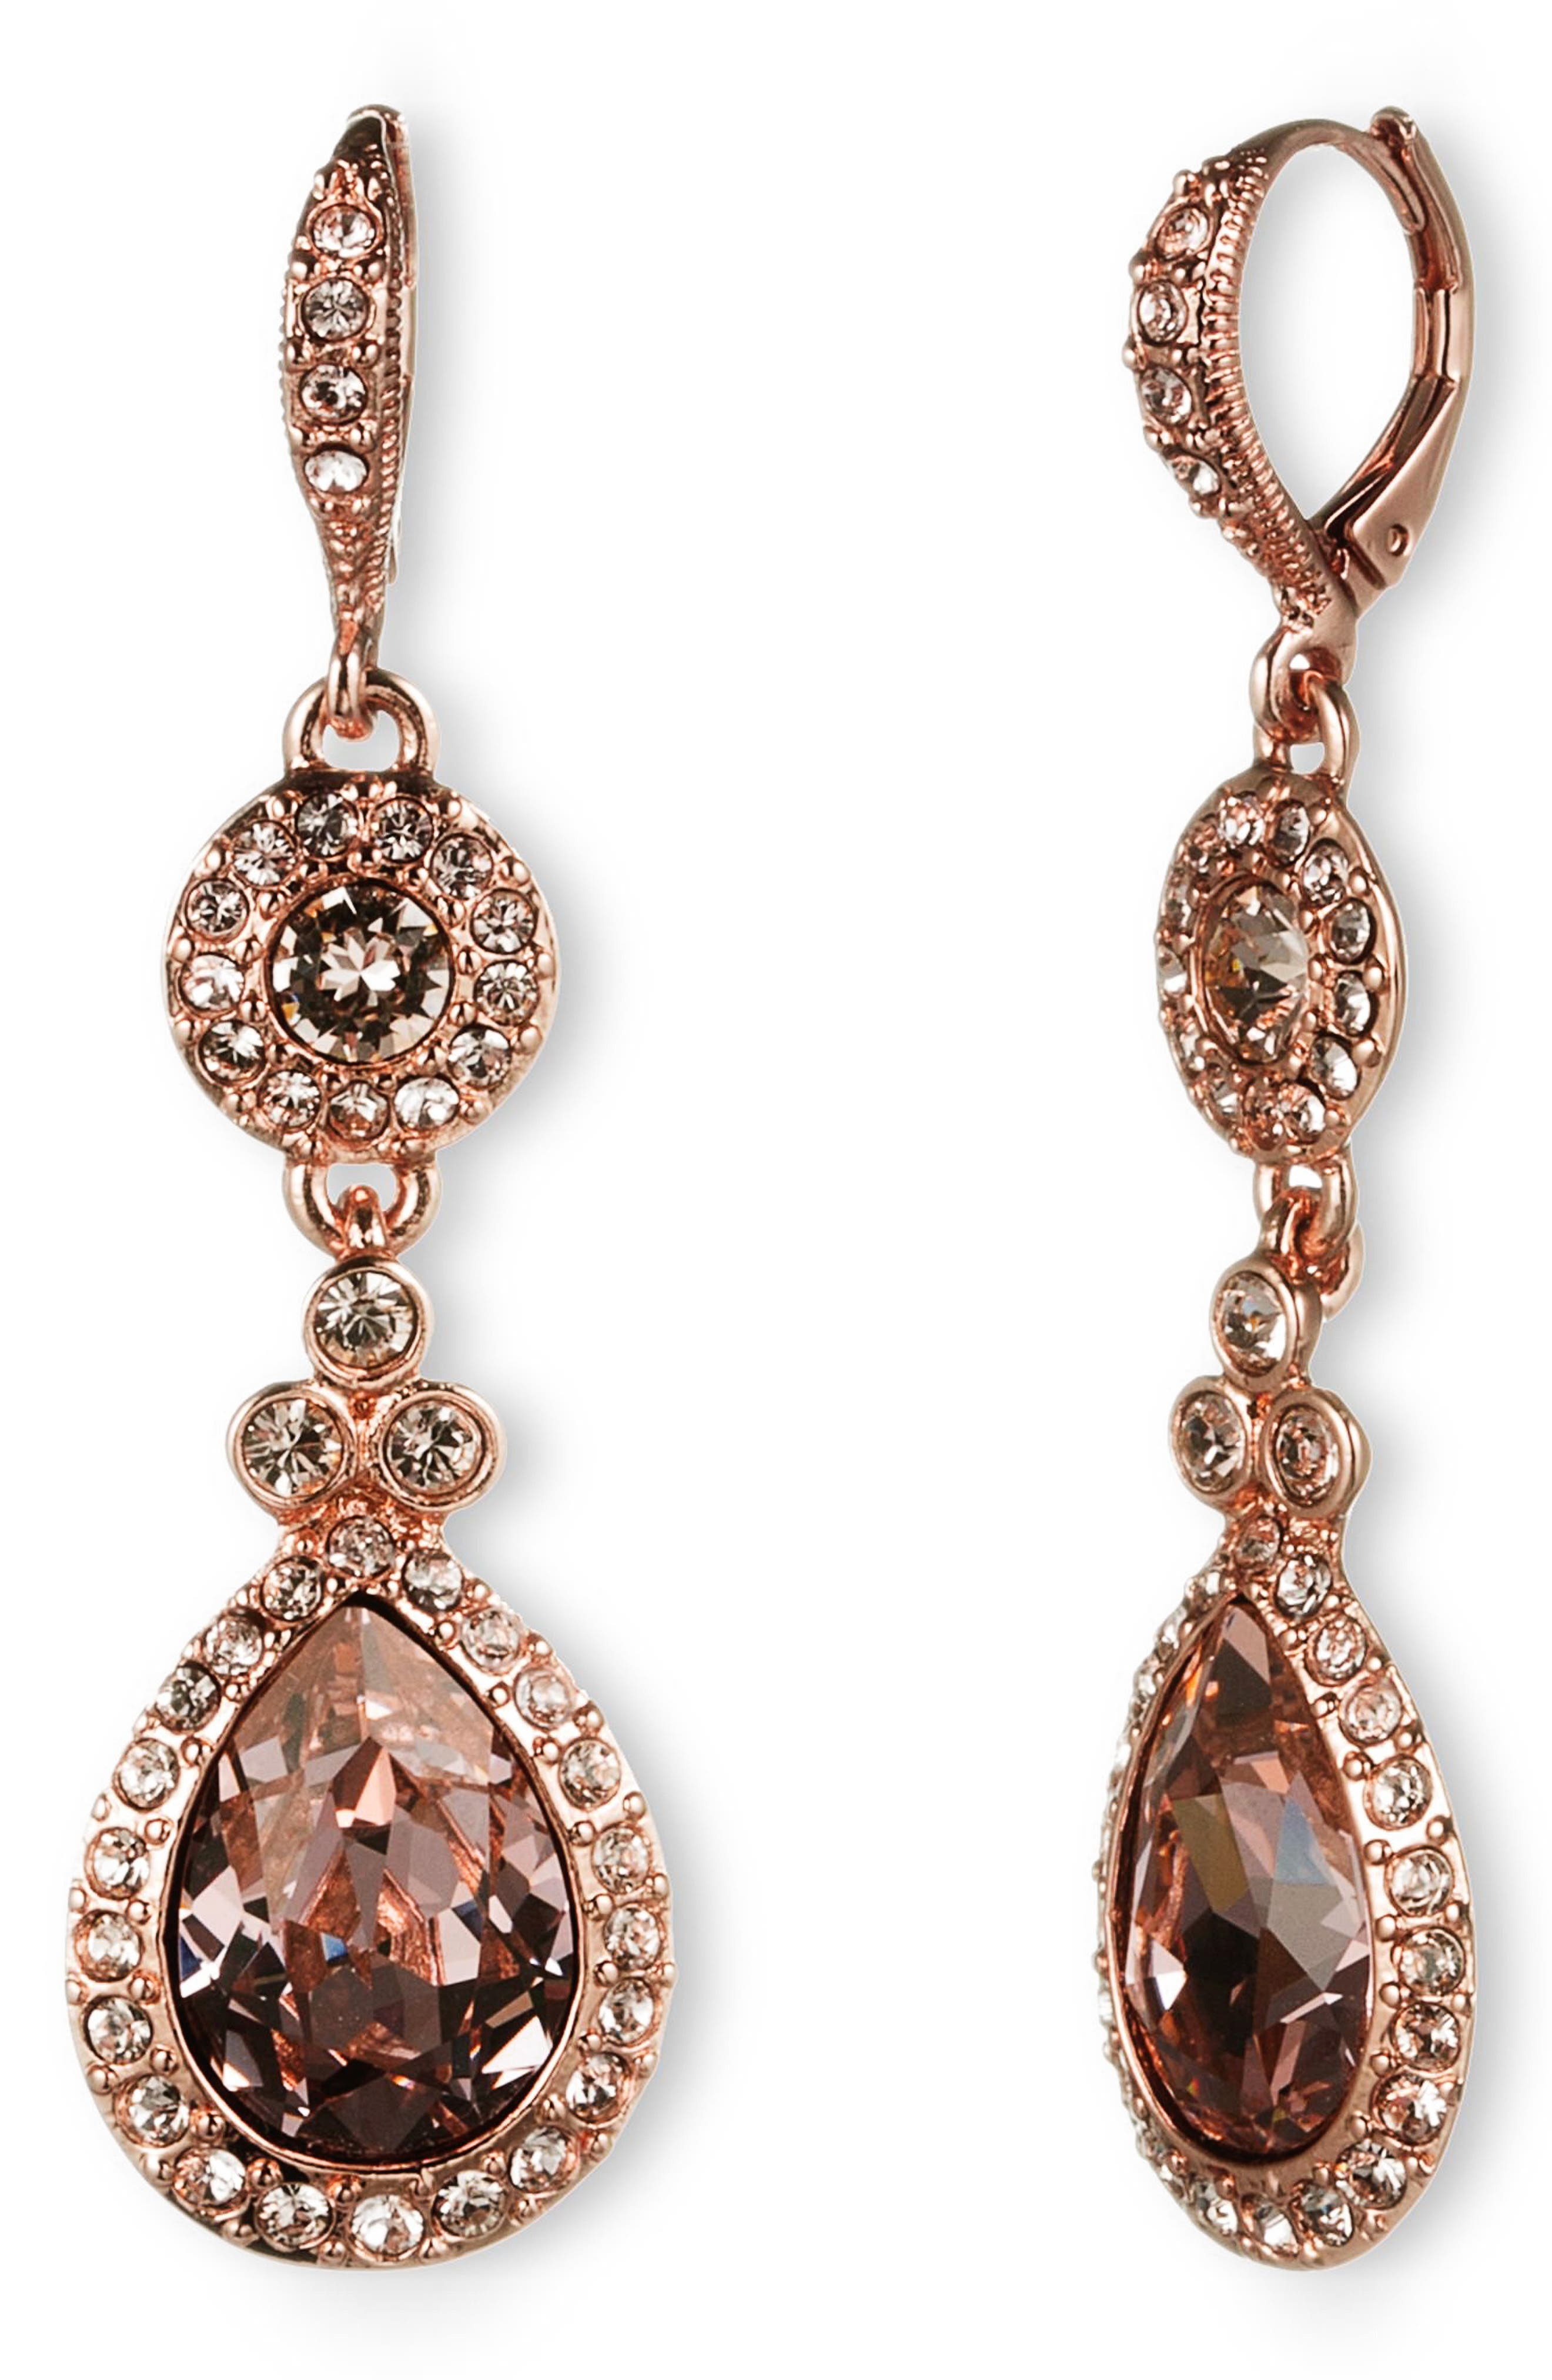 Crystal Teardrop Earrings,                             Alternate thumbnail 2, color,                             600